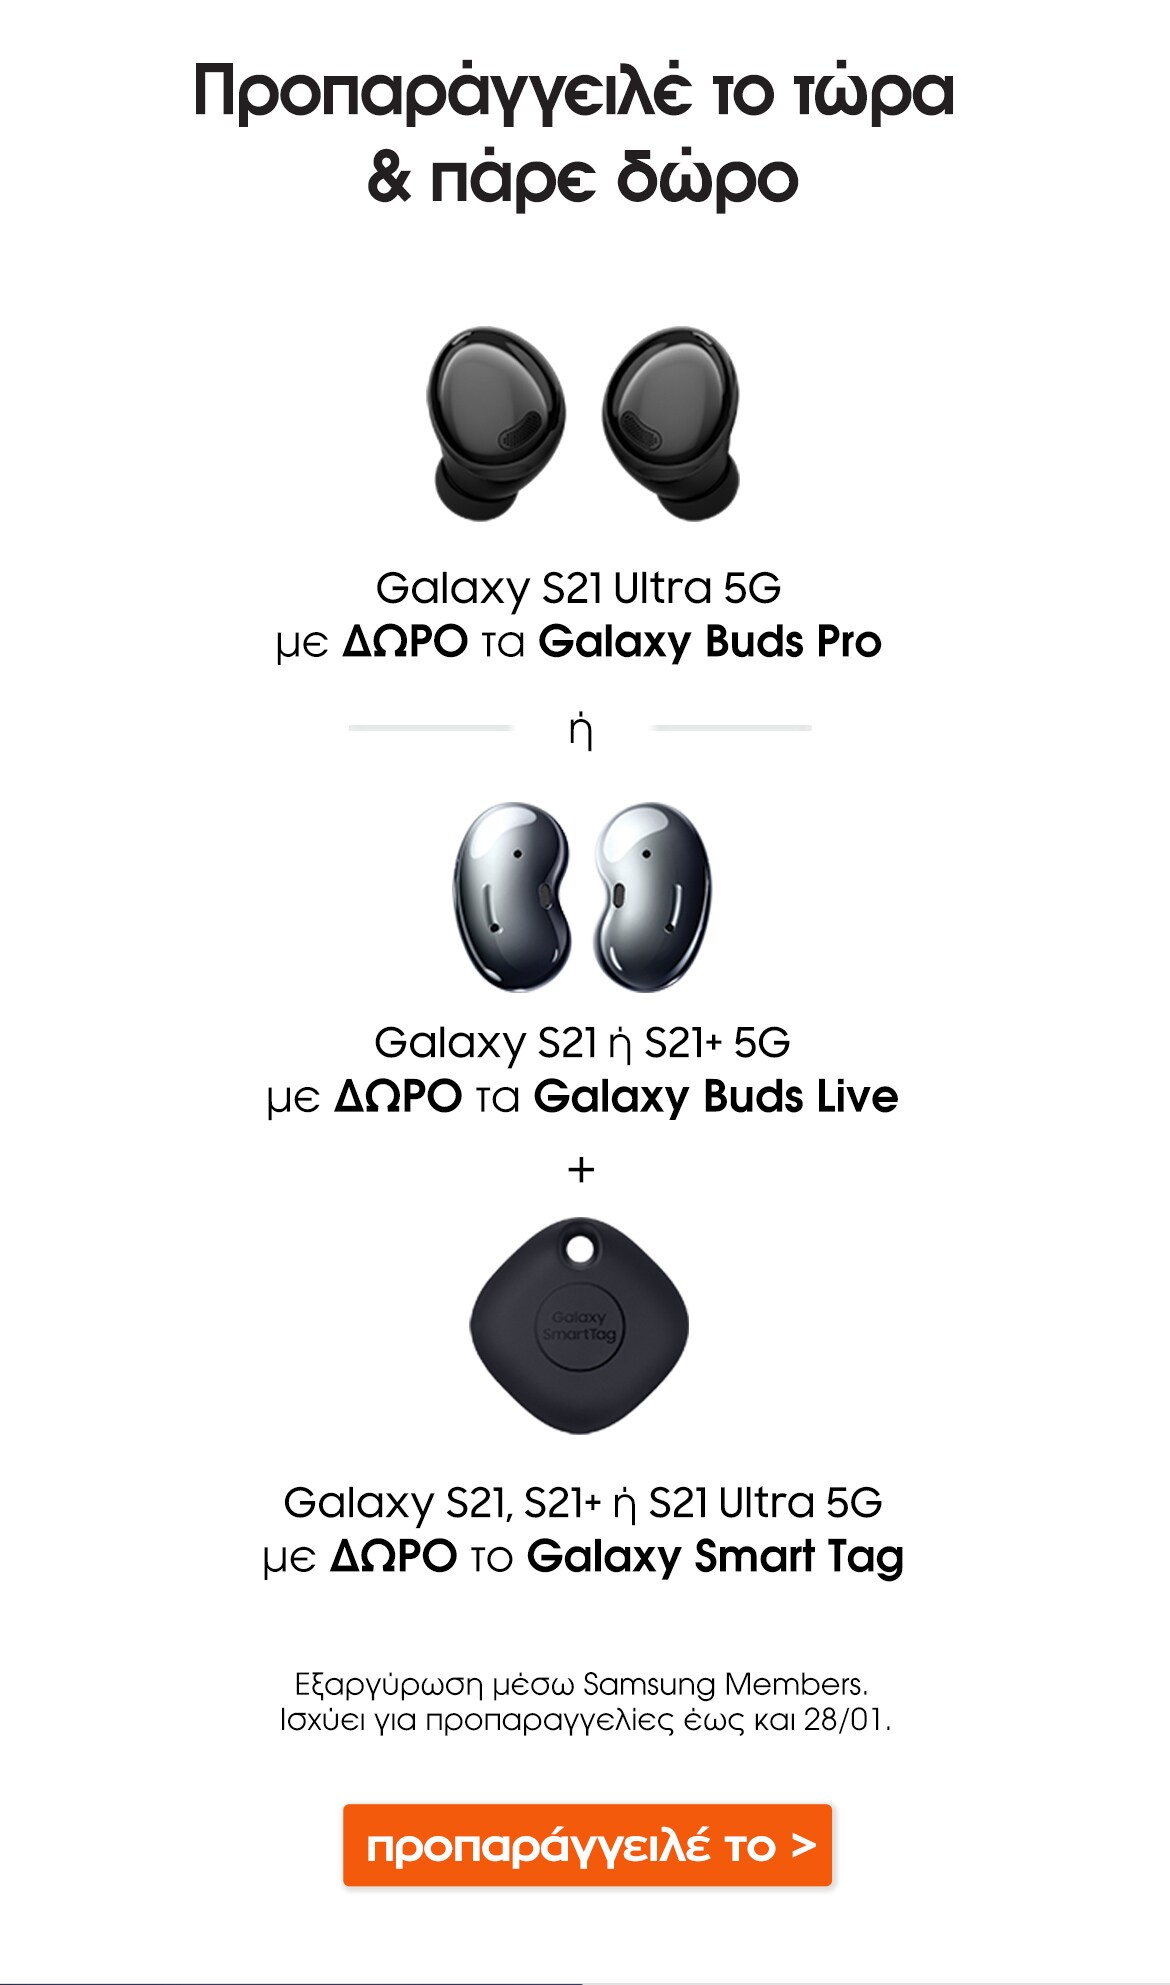 Samsung Galaxy S21 | Προπαράγγειλέ το και πάρε δώρο